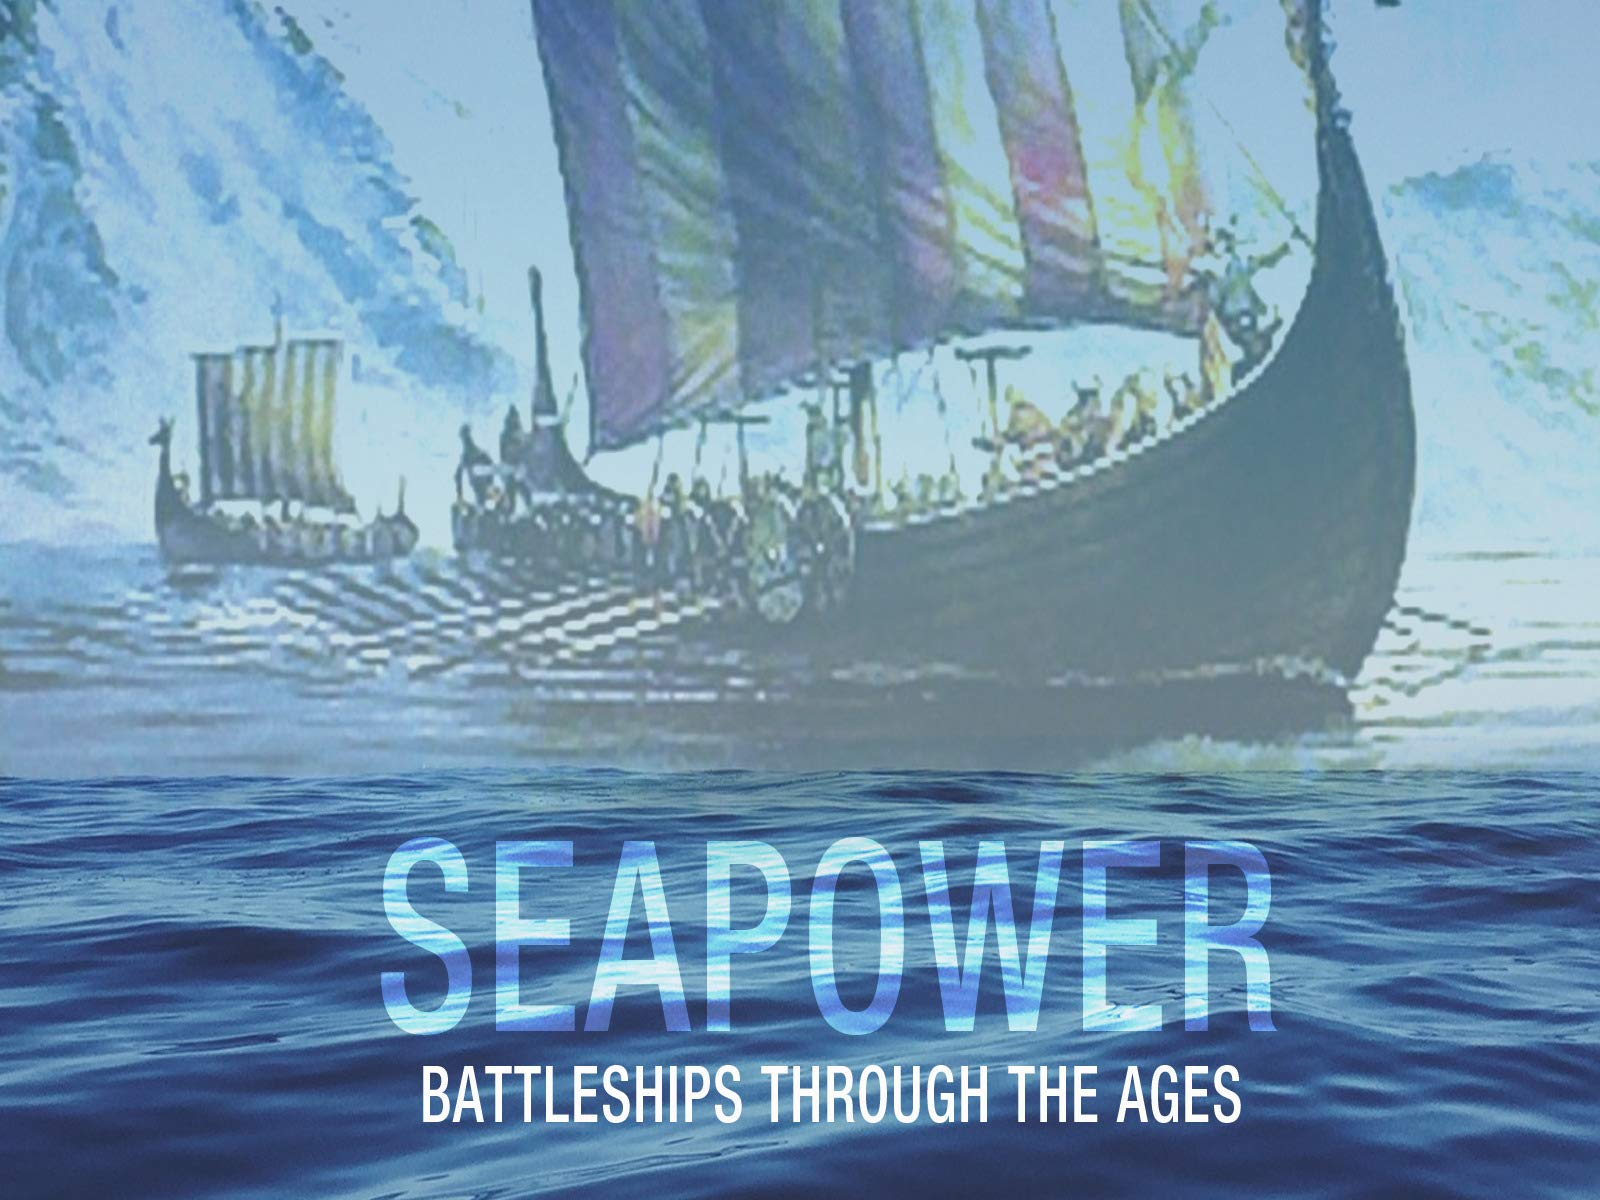 Seapower - Battleships Through The Ages on Amazon Prime Video UK